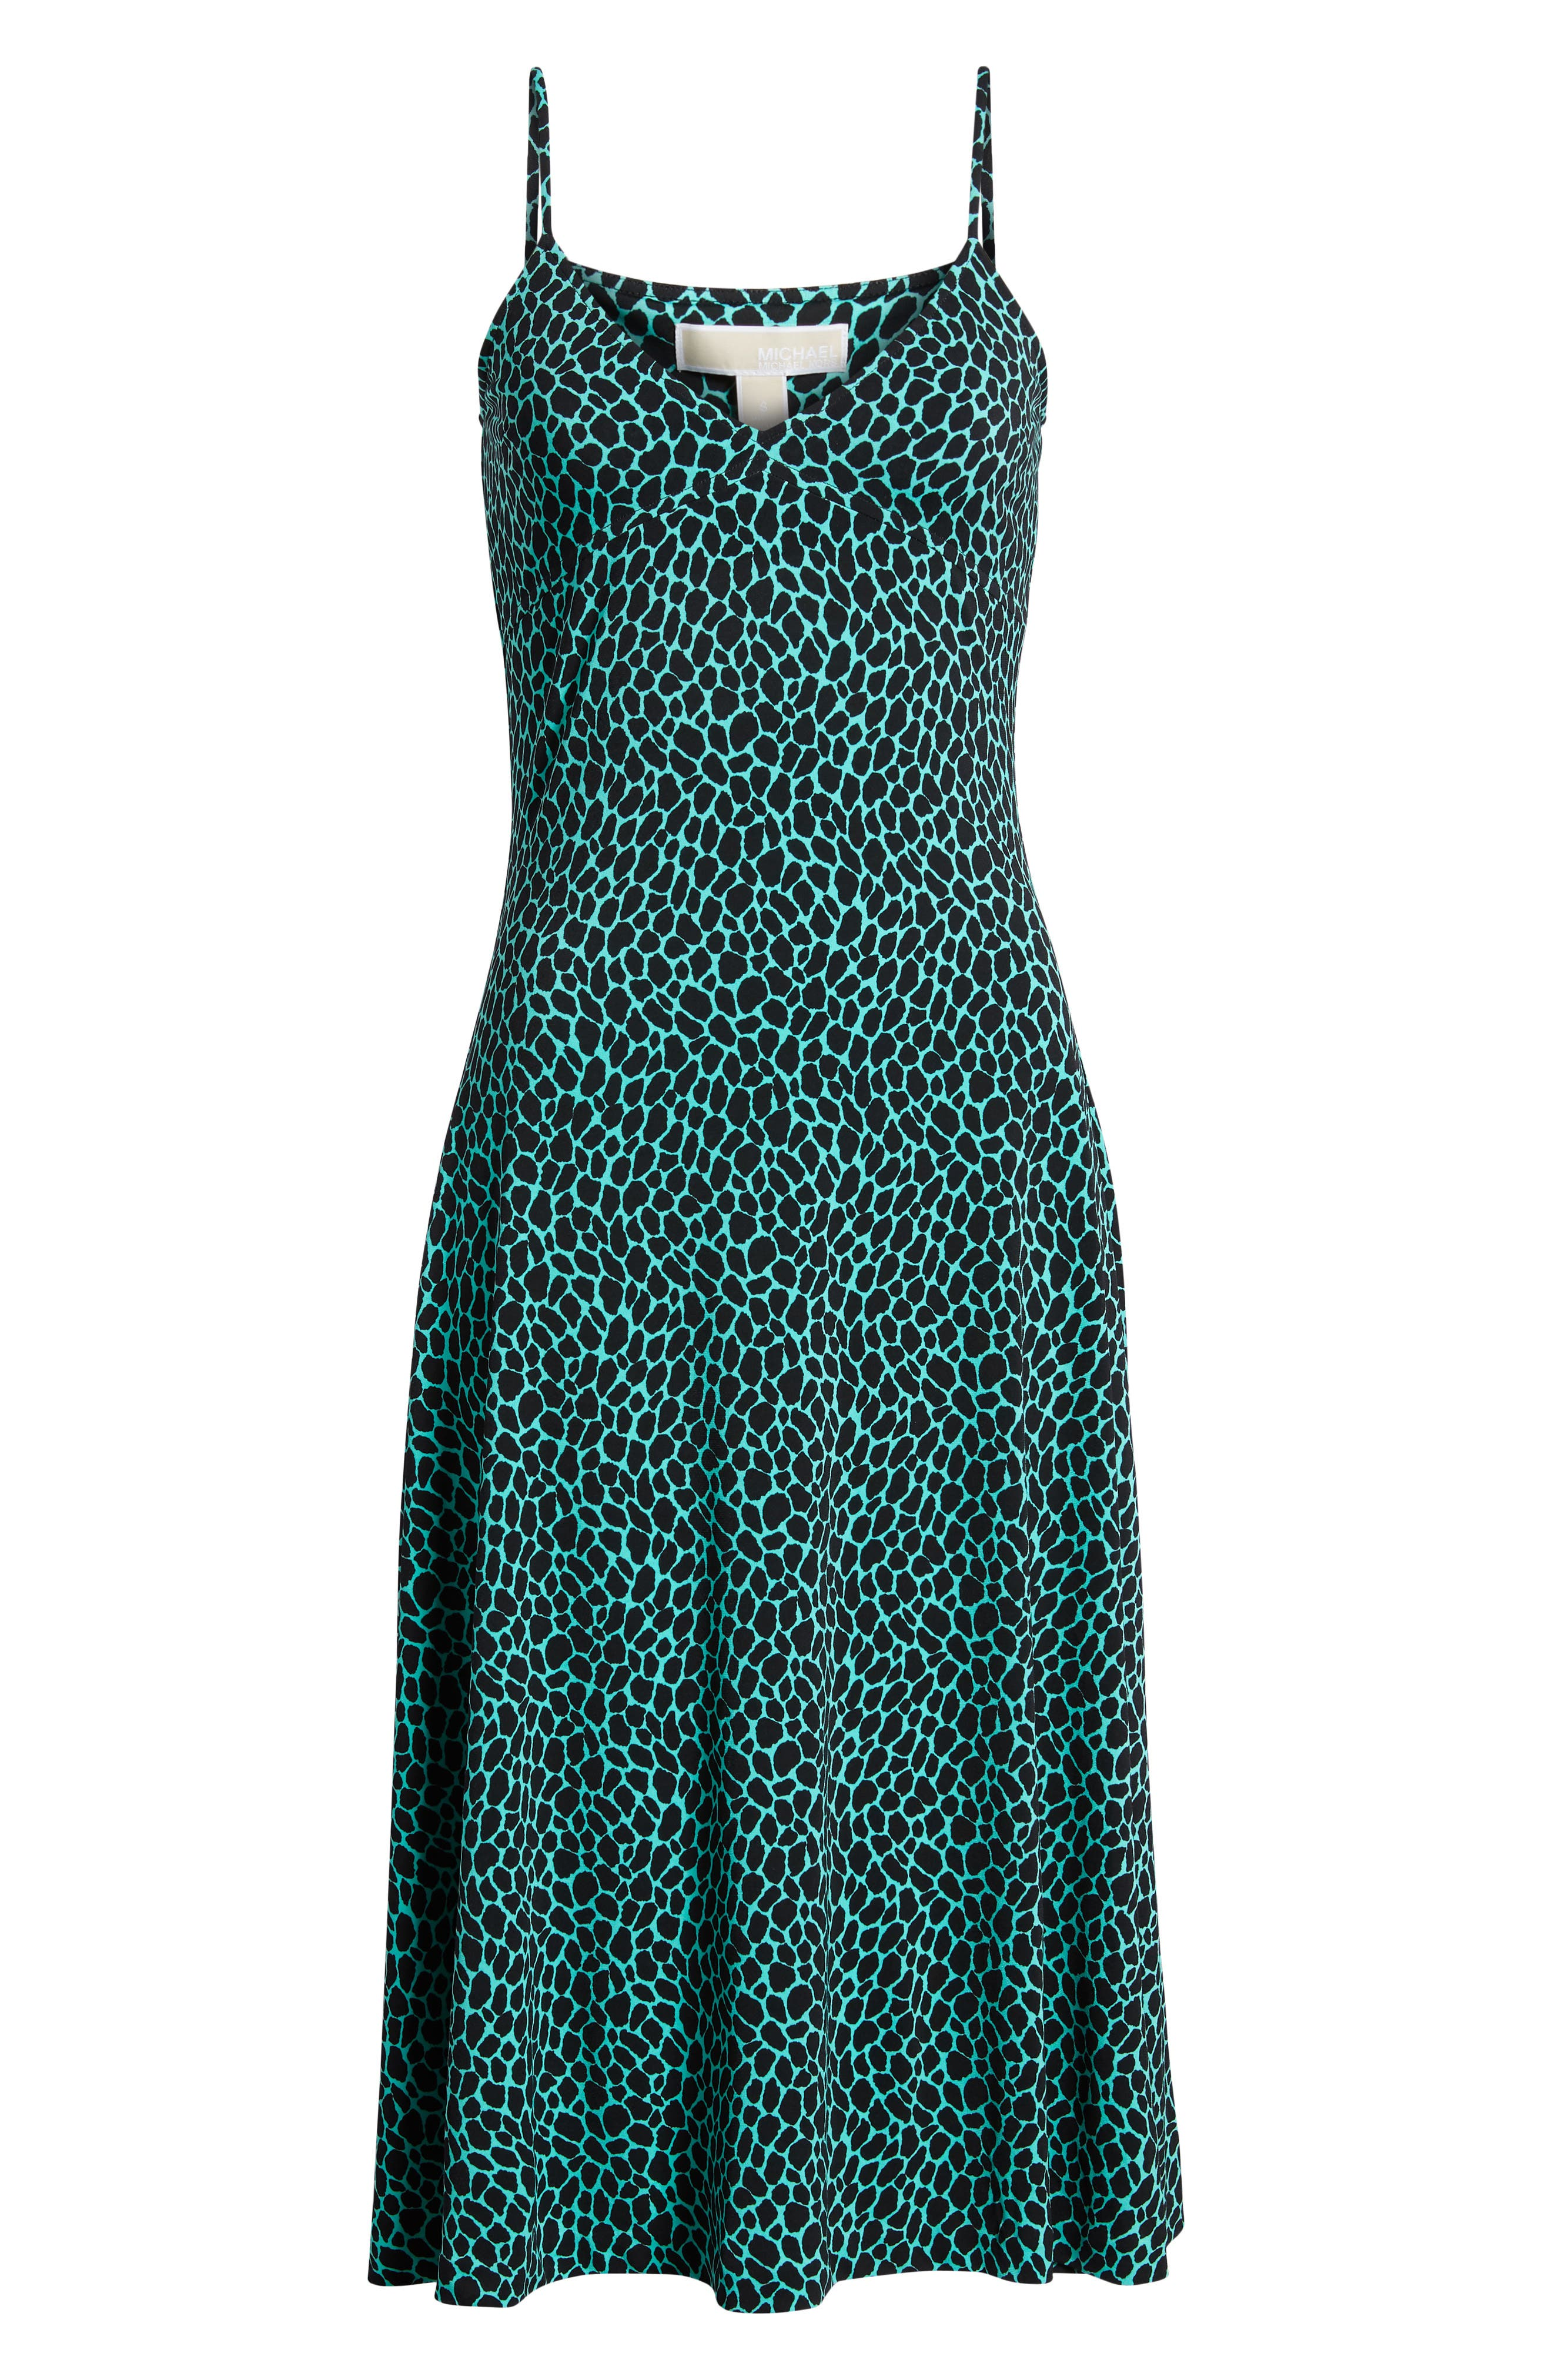 Graphic Leopard Tank Midi Dress,                             Alternate thumbnail 7, color,